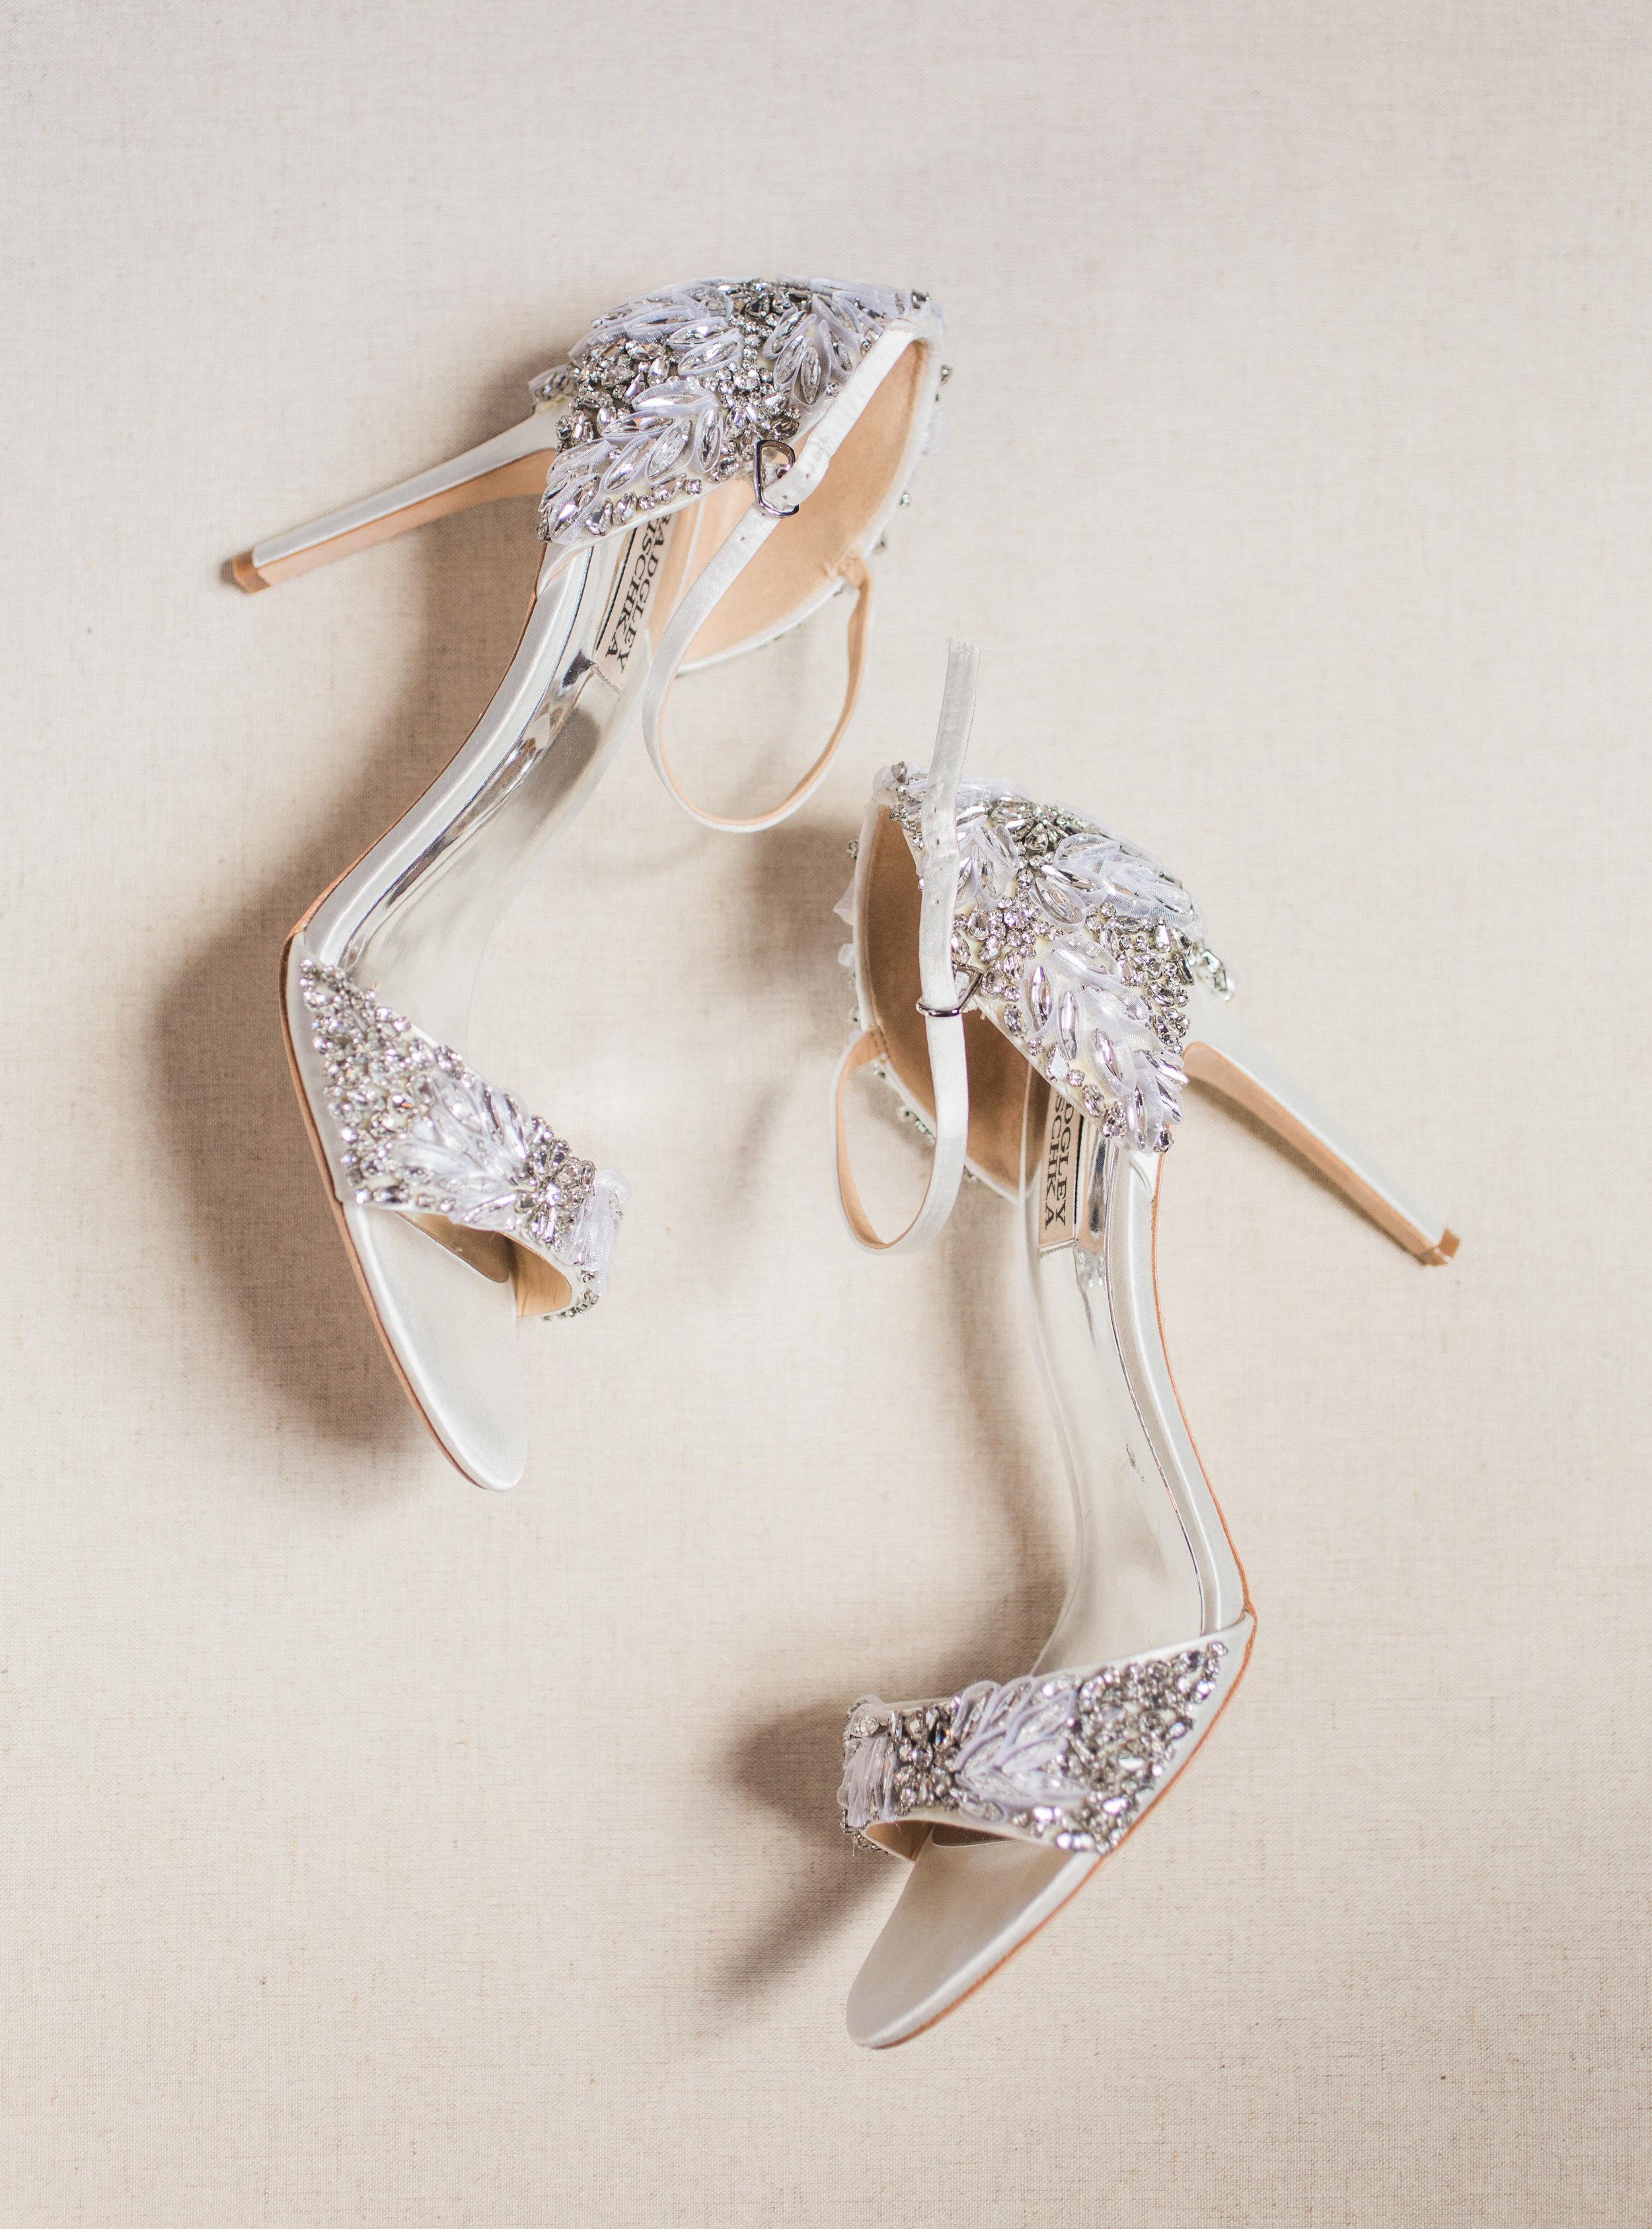 Hudson-Nichols-Black-Tie-Bride-Philadelphia-Waterworks-Wedding-Badgley-Mischka-shoes01.jpg